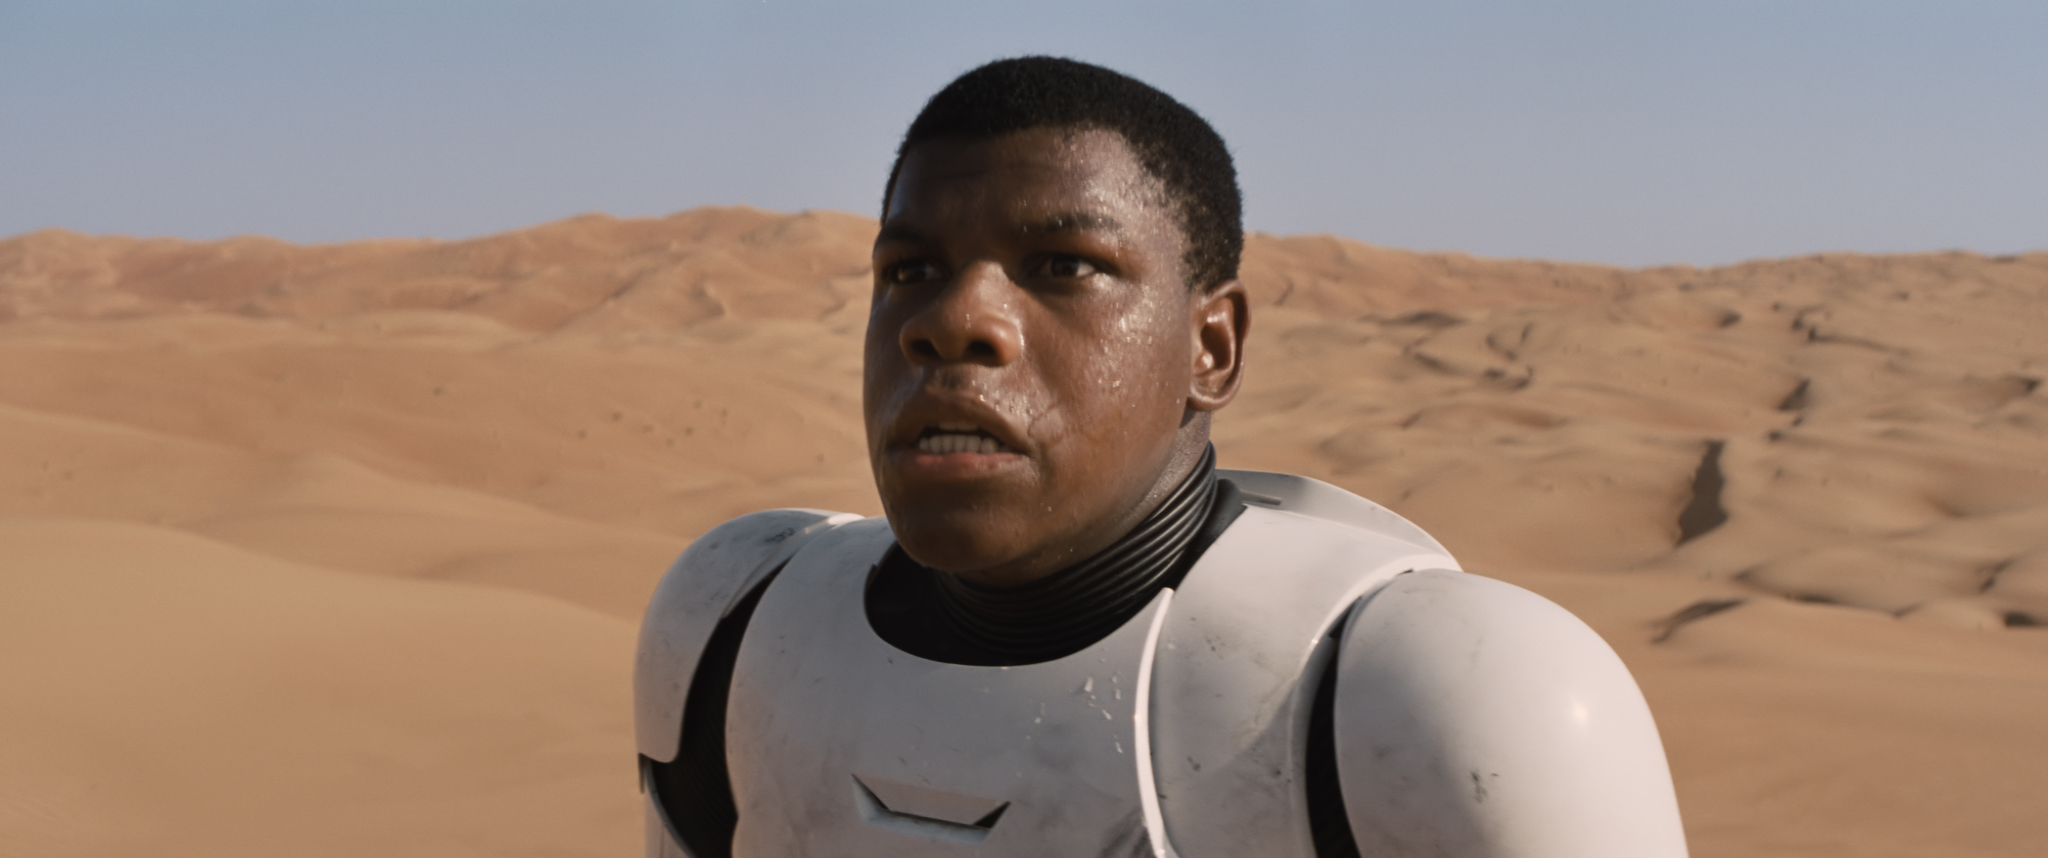 Stills from Star Wars: The Force Awakens